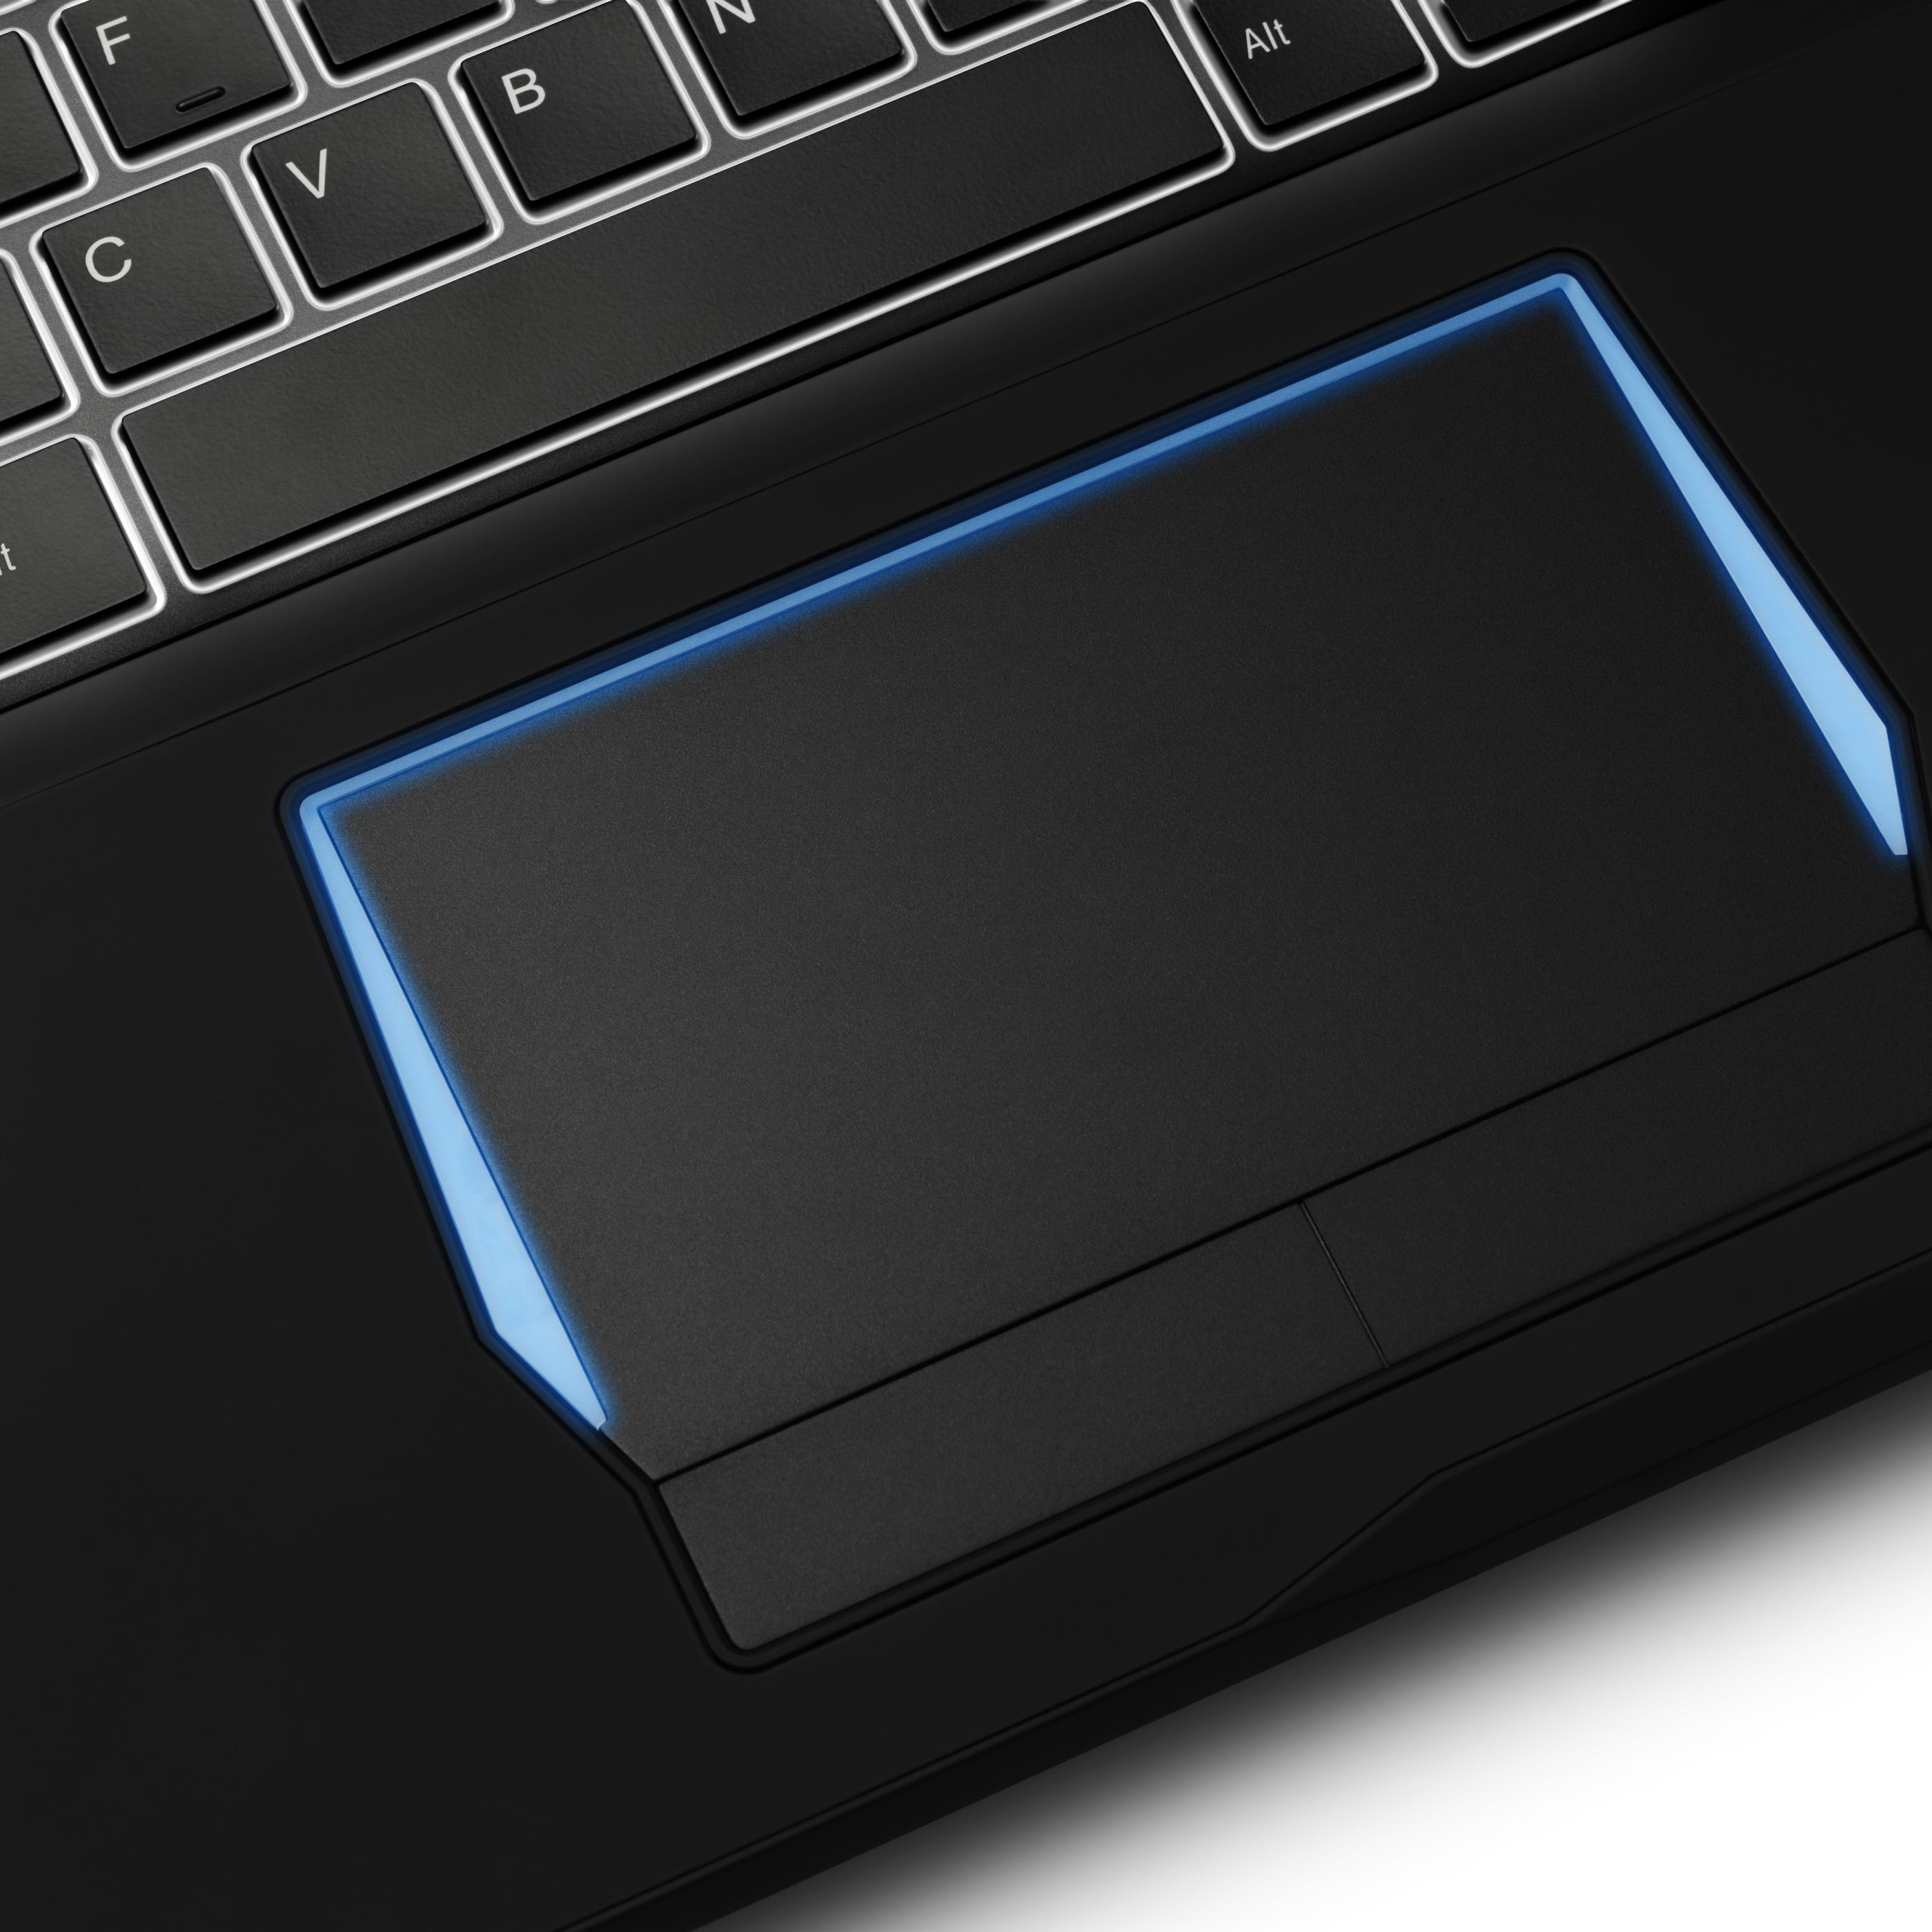 "Medion Erazer X7842 Gaming Notebook - 17,3"" FHD, Intel Core i7-6700HQ, 8GB, 128GB SSD + 1500GB, GeForce GTX 970M, Win10 für 999,-€ [Mediamarkt GDD]"